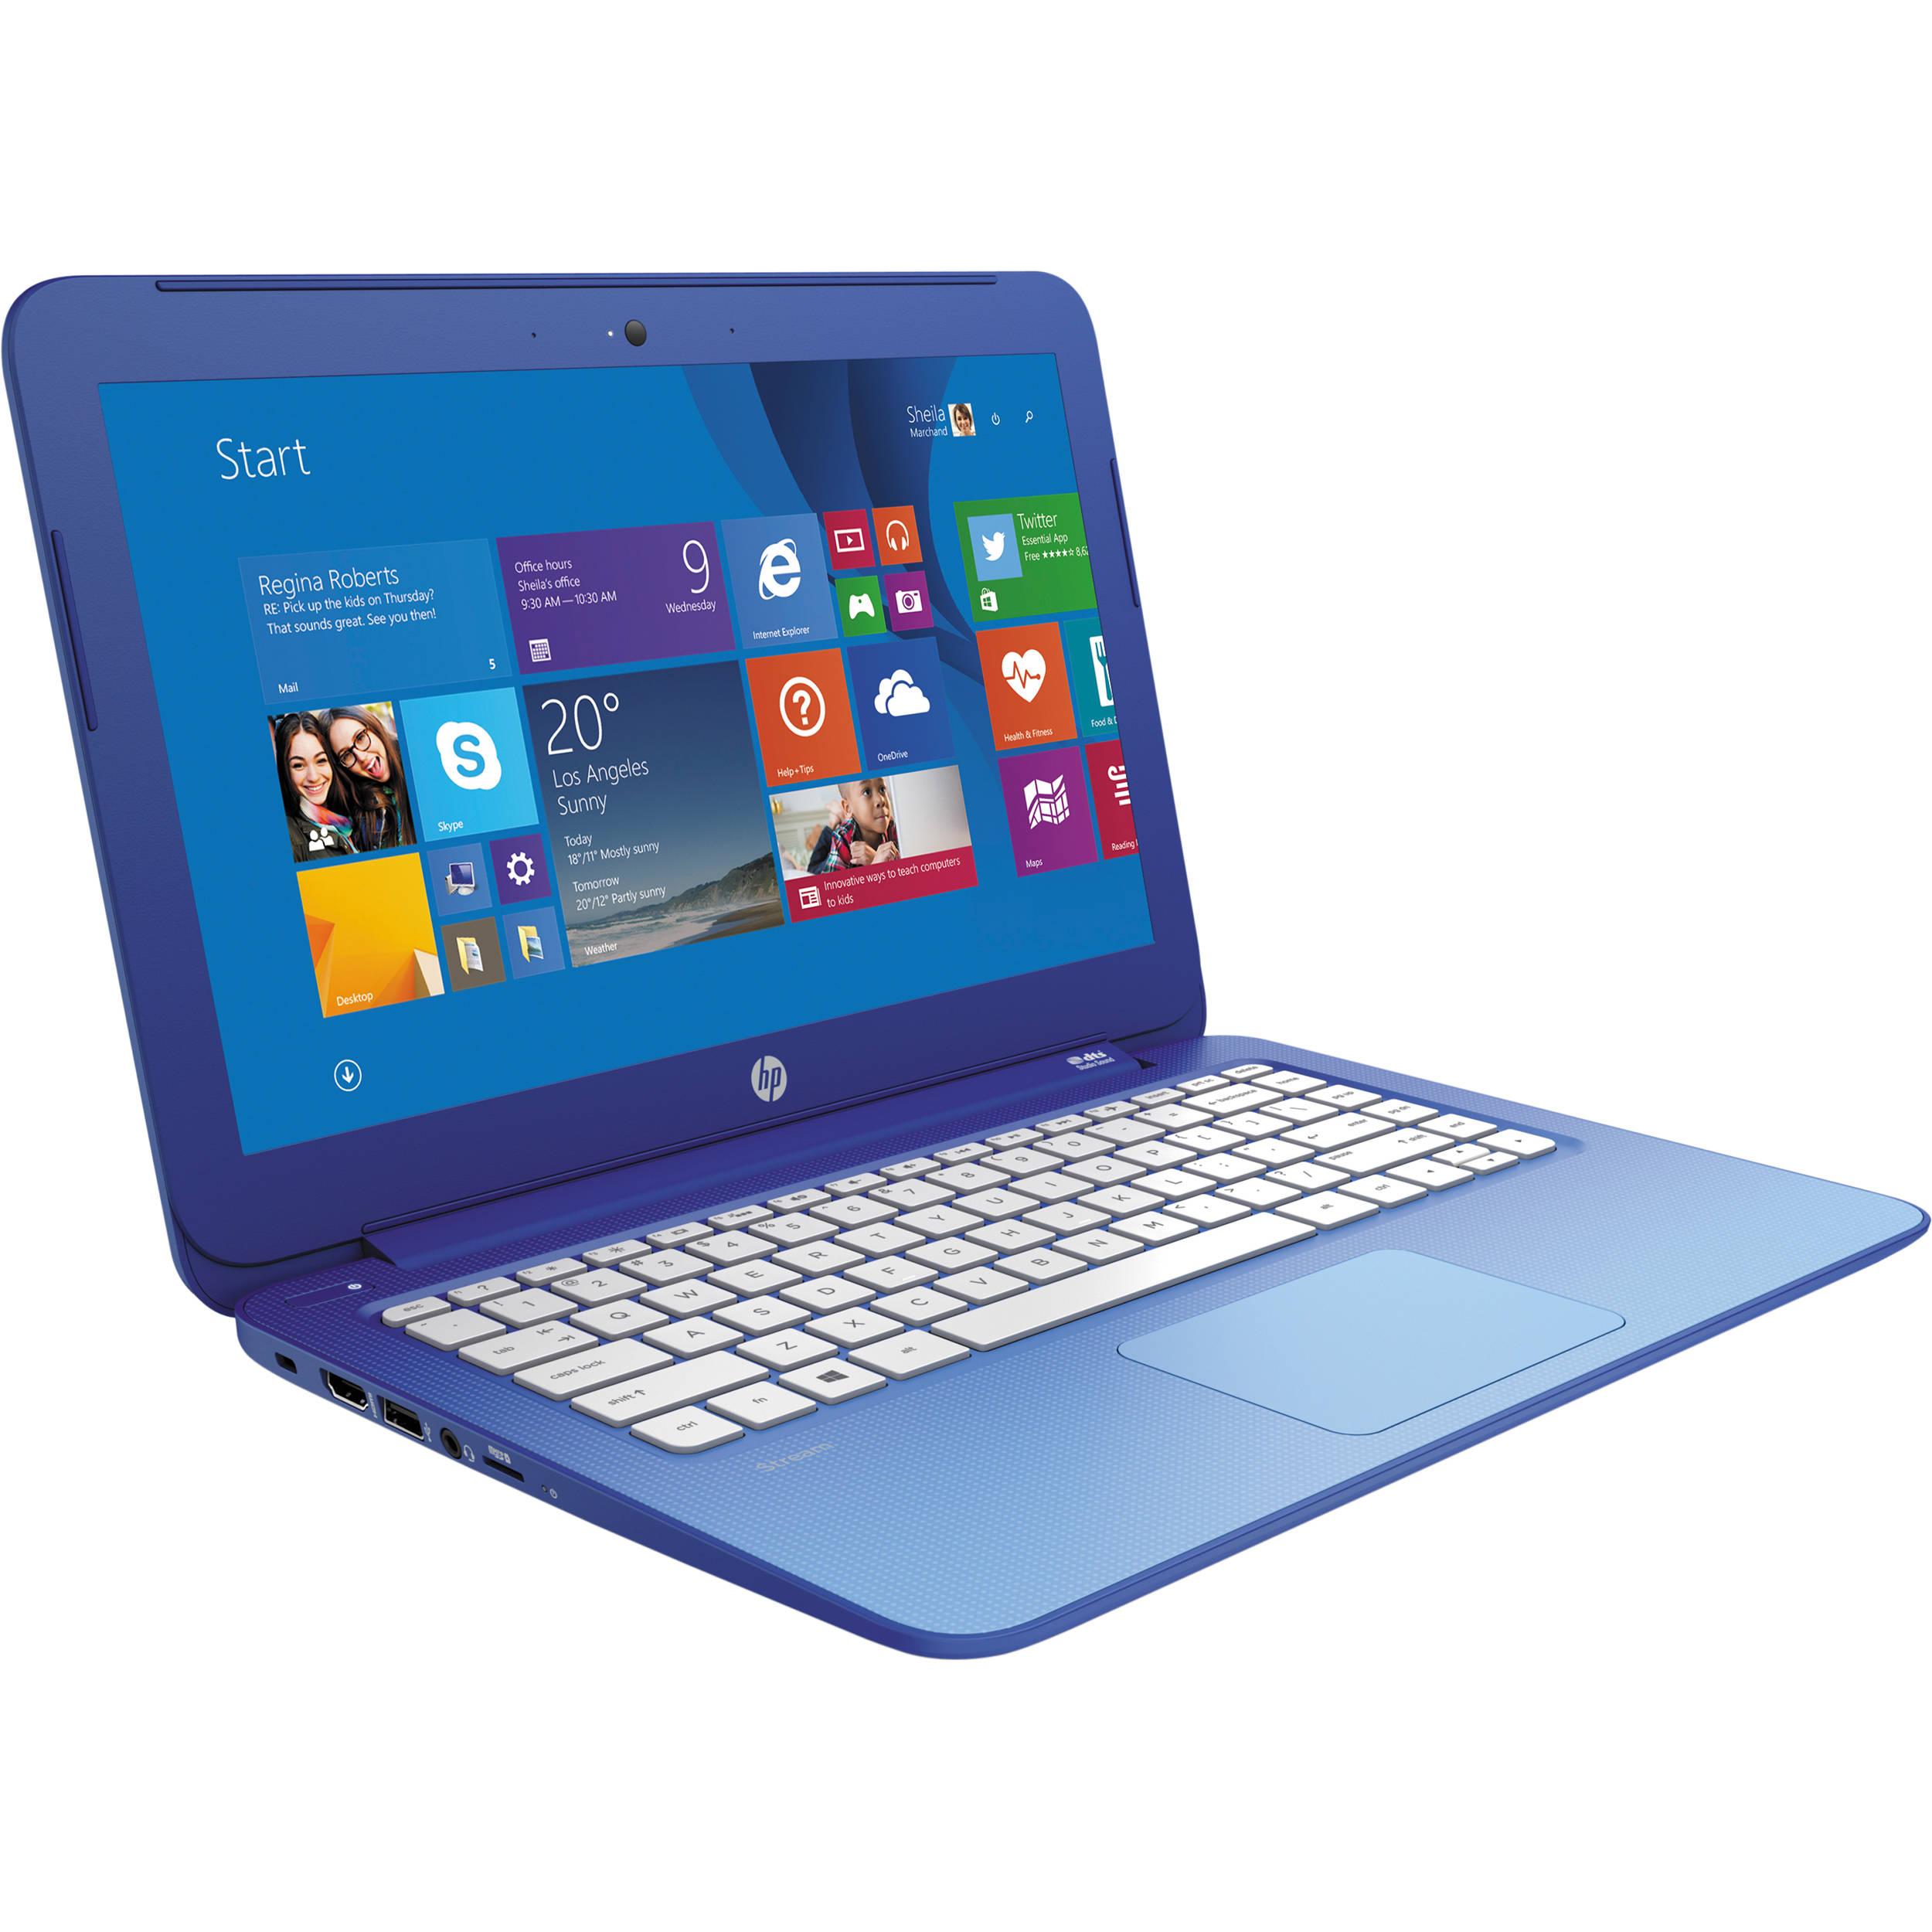 Hp Stream 13 3 Quot 13 C010nr Laptop Notebook Computer K2l96ua Aba B Amp H